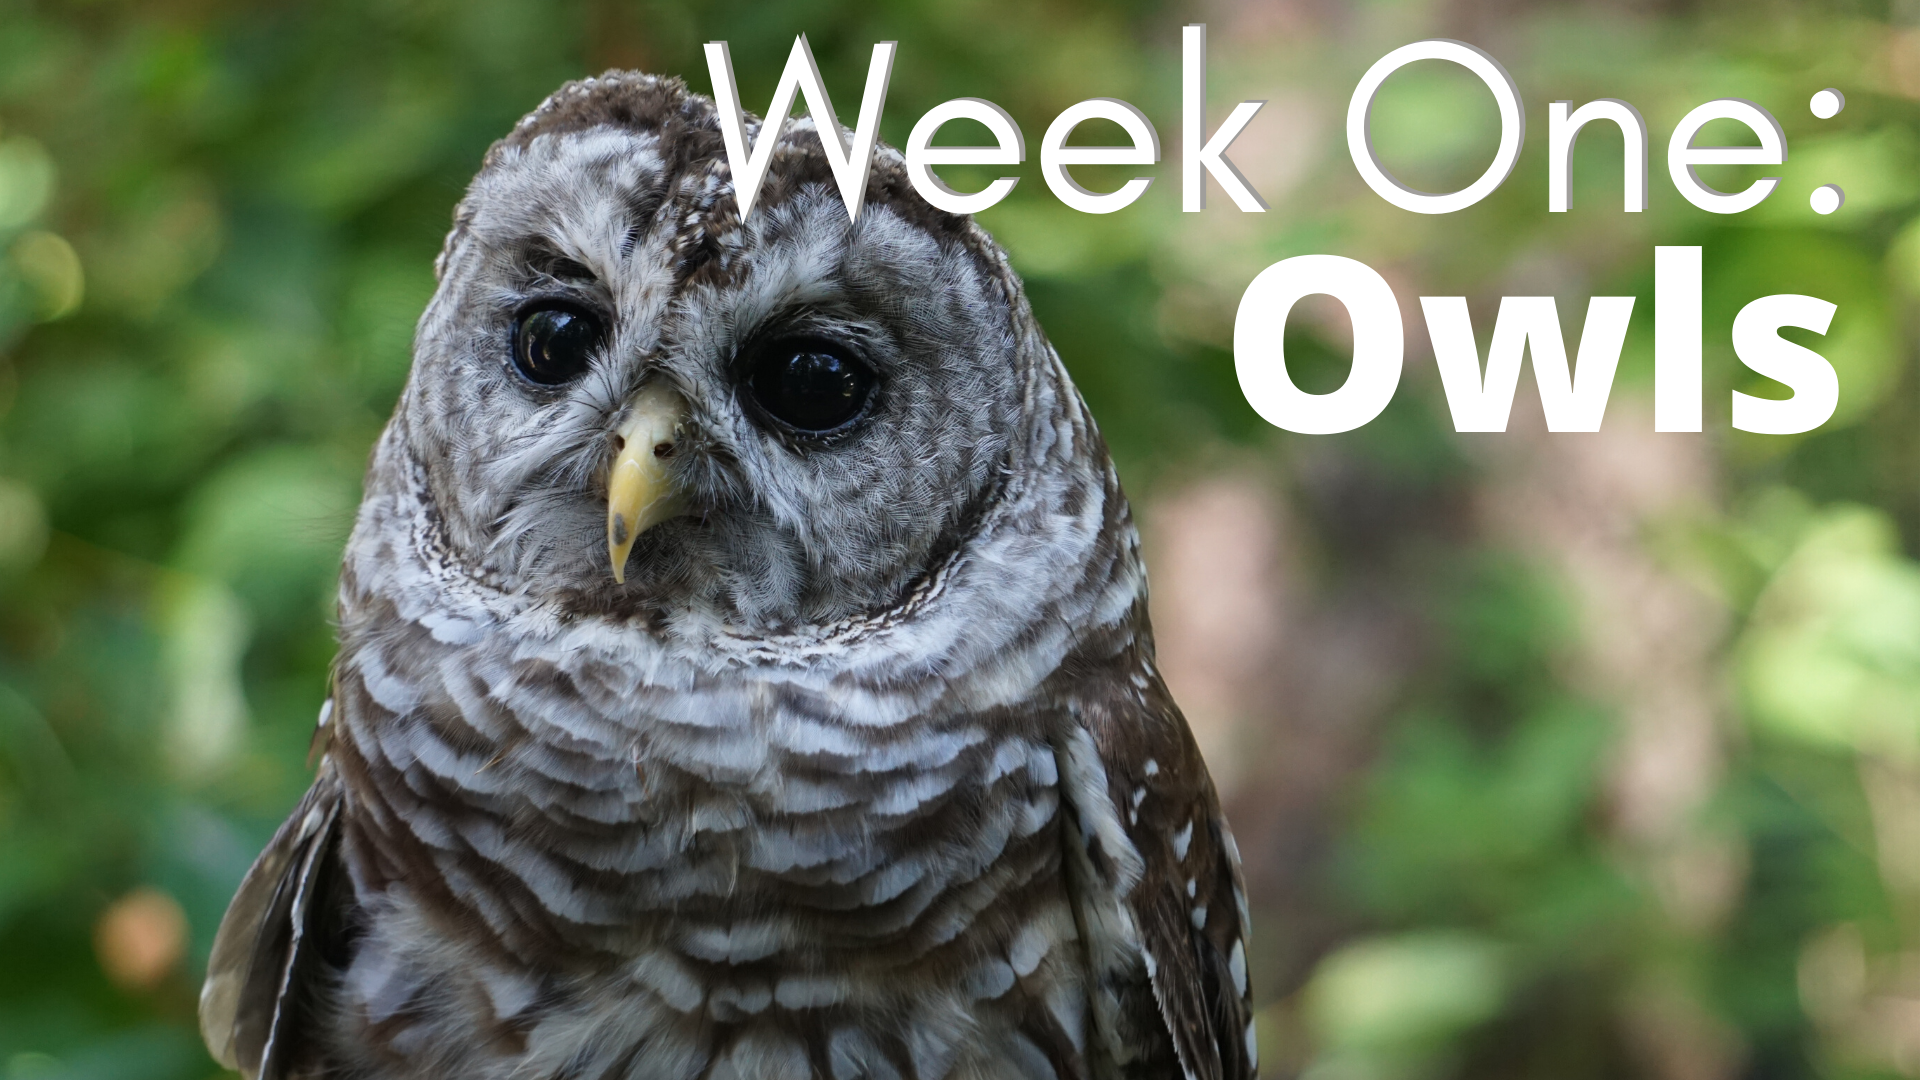 Week One: Owls